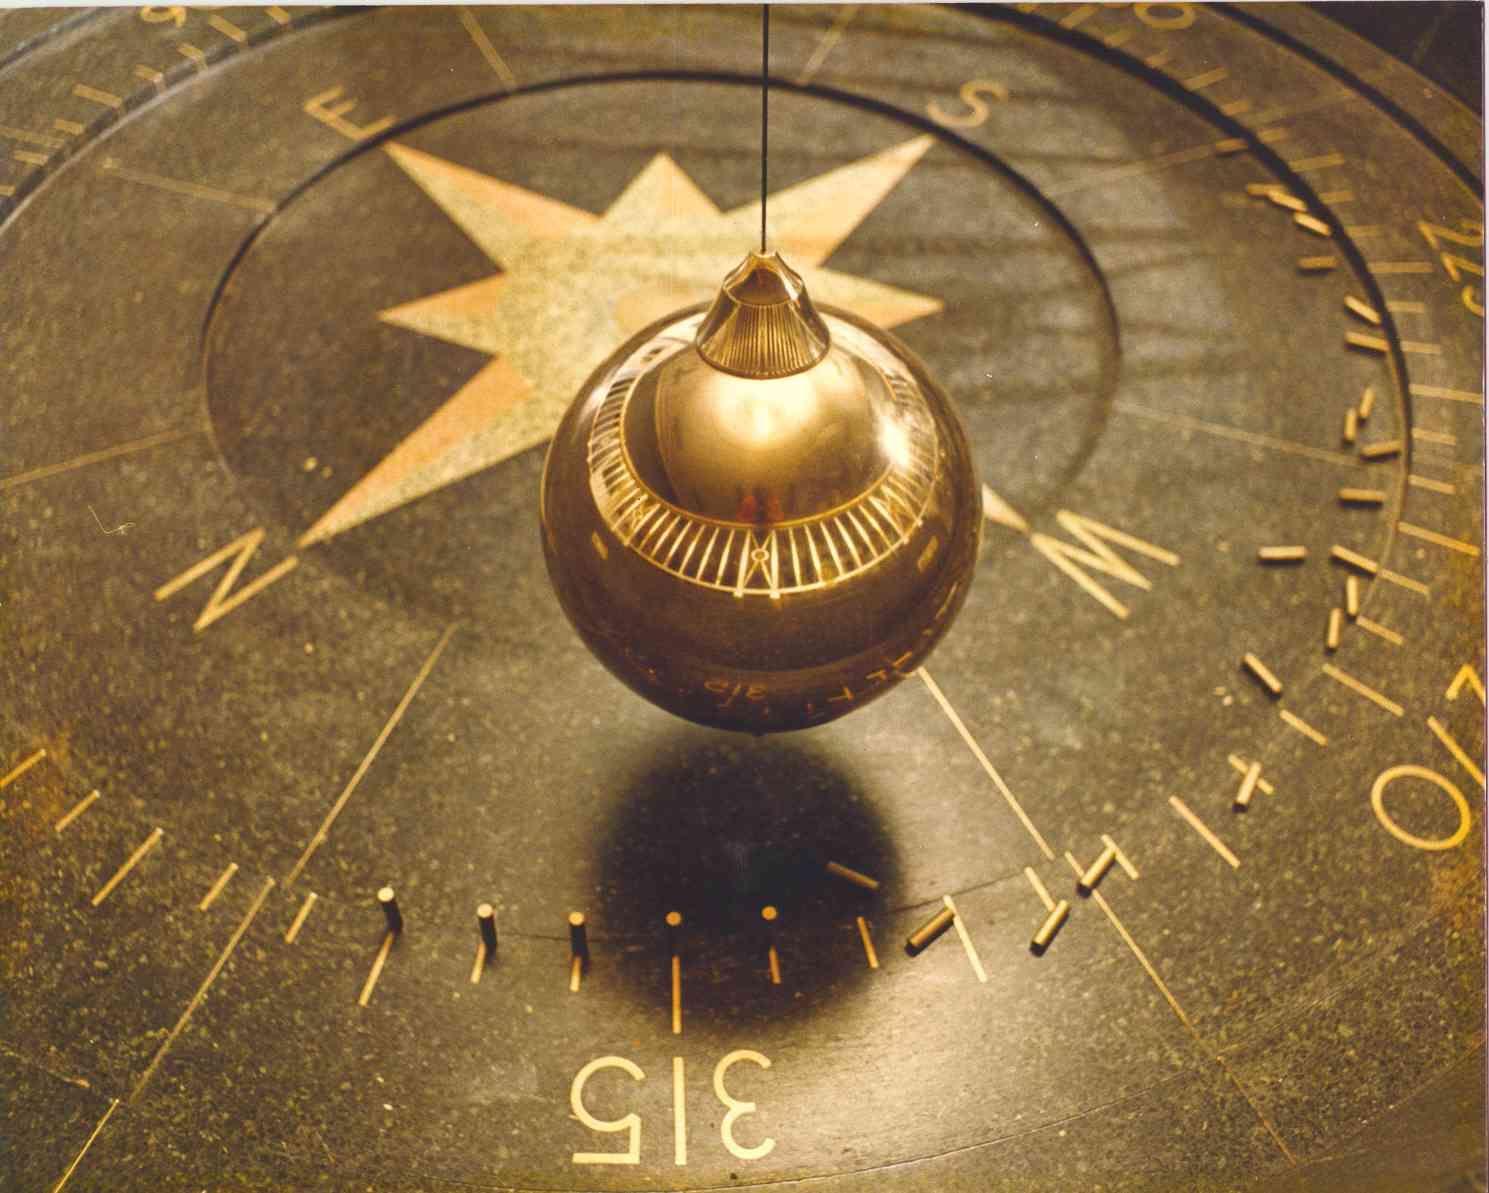 18th century pendulum google search foucault pendulum